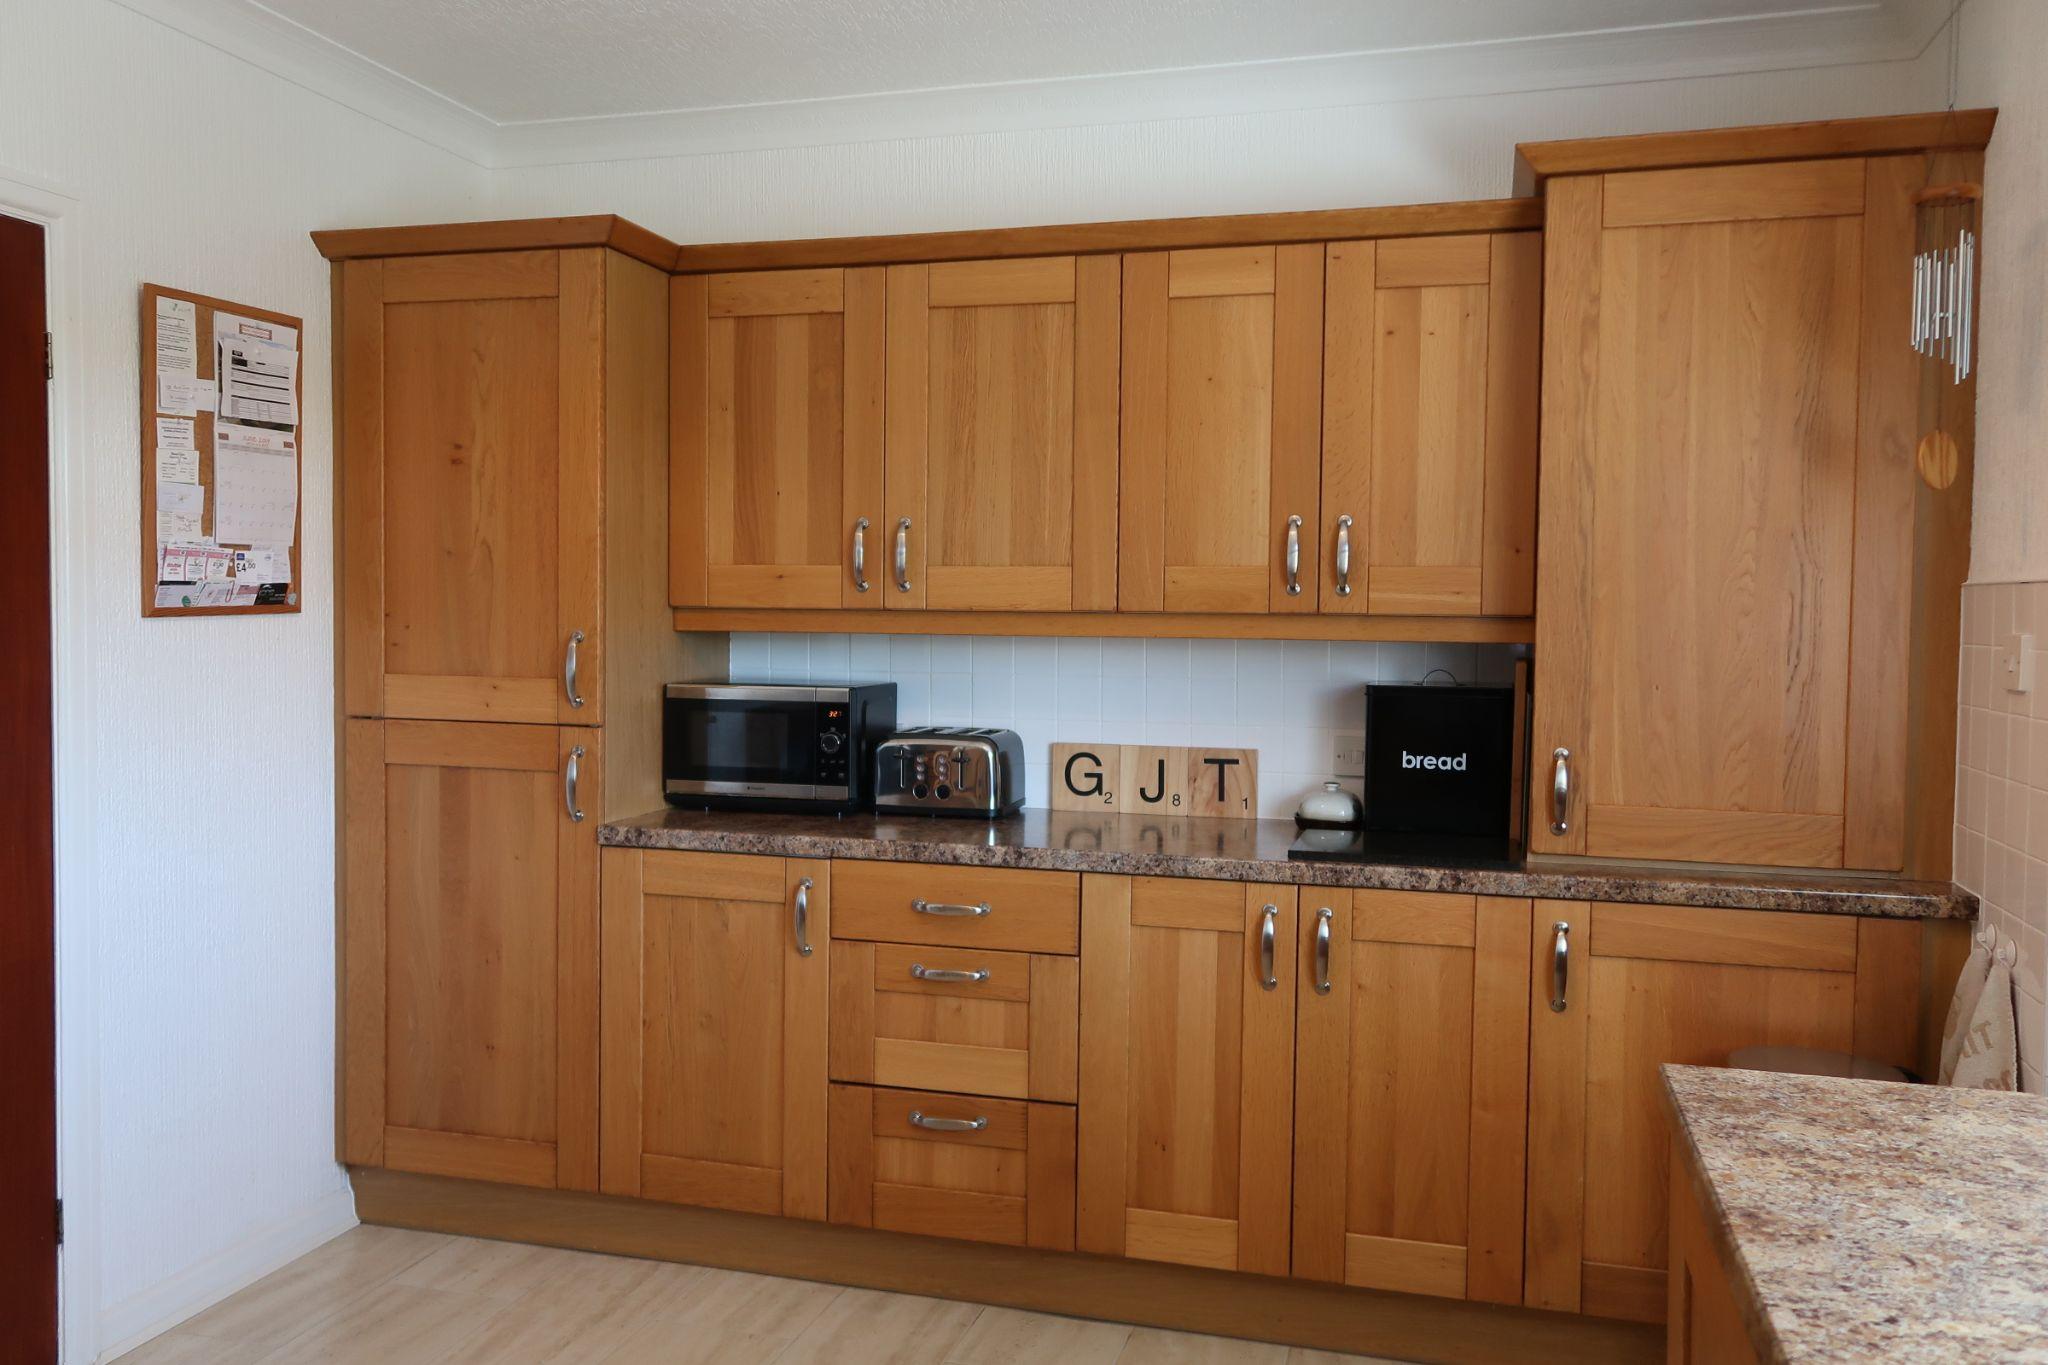 3 bedroom detached bungalow SSTC in Port Erin - Property photograph